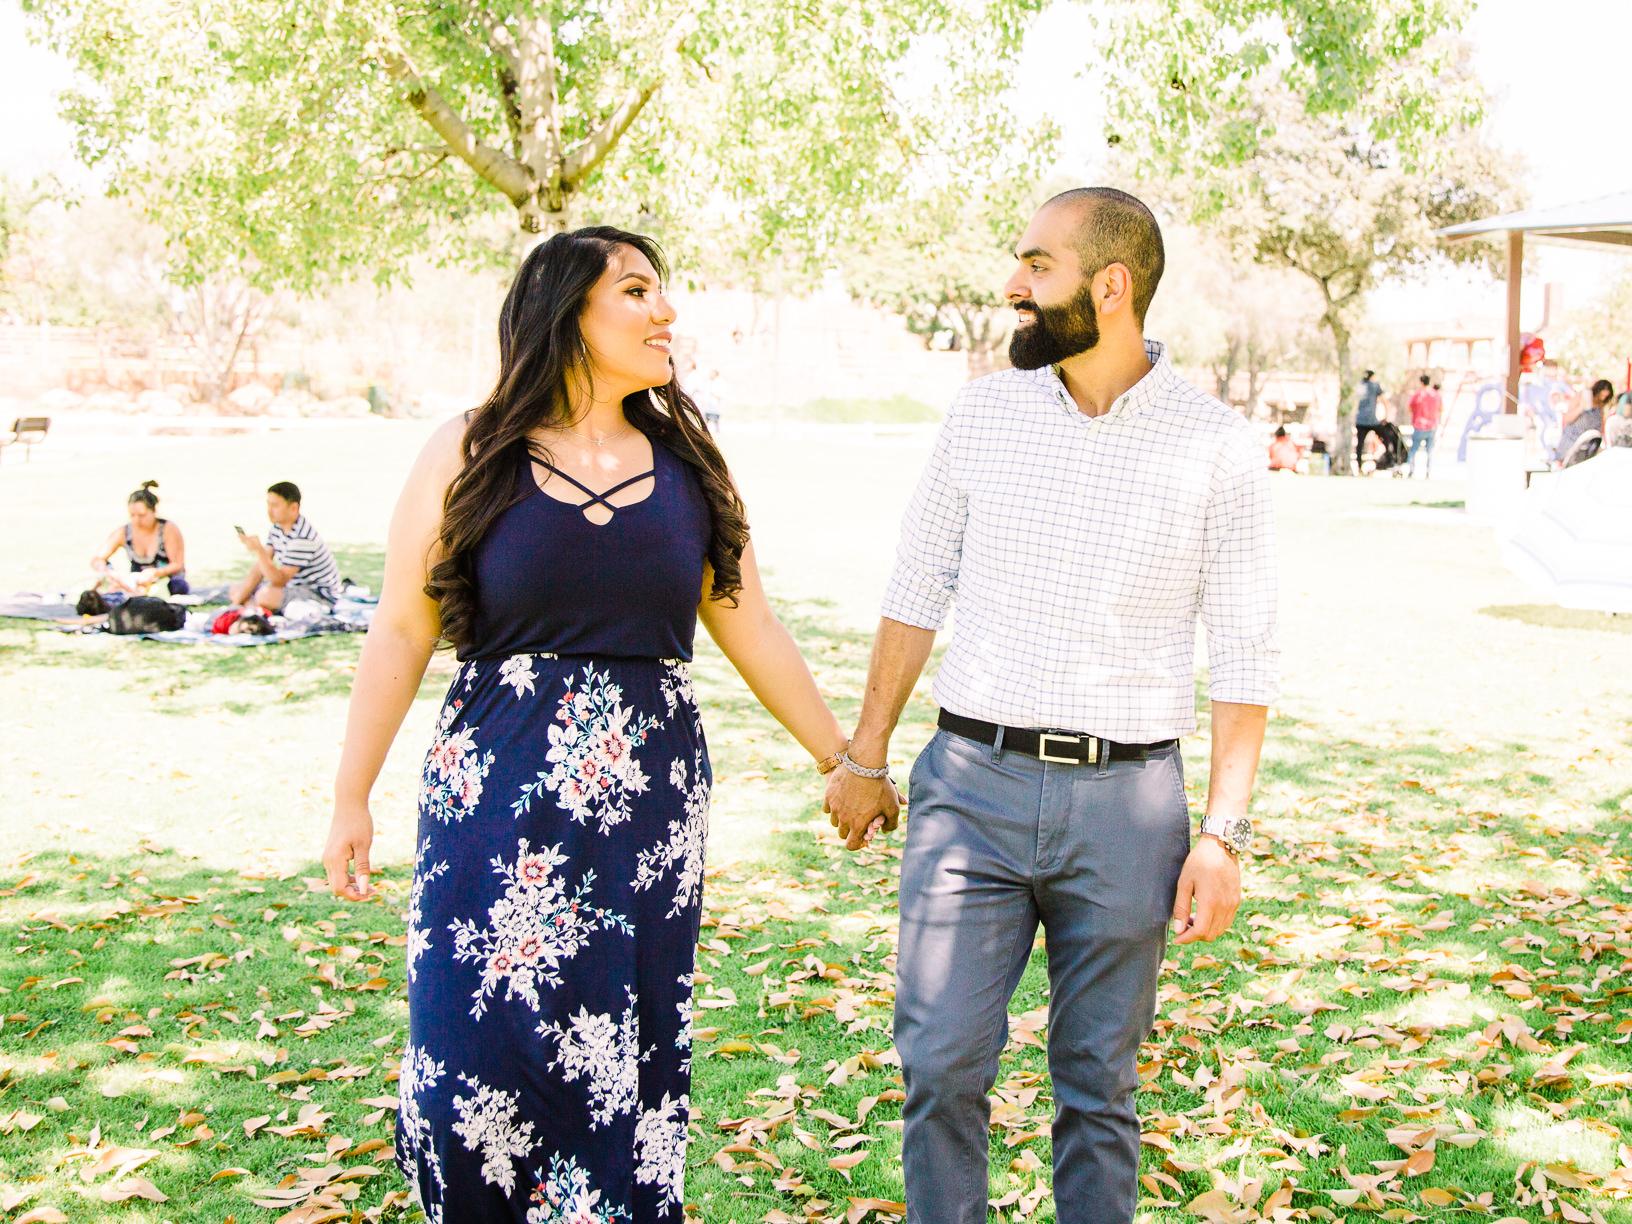 Gabriela & Eric Engagment Photoshoot - Heritage Park, Cerritos,